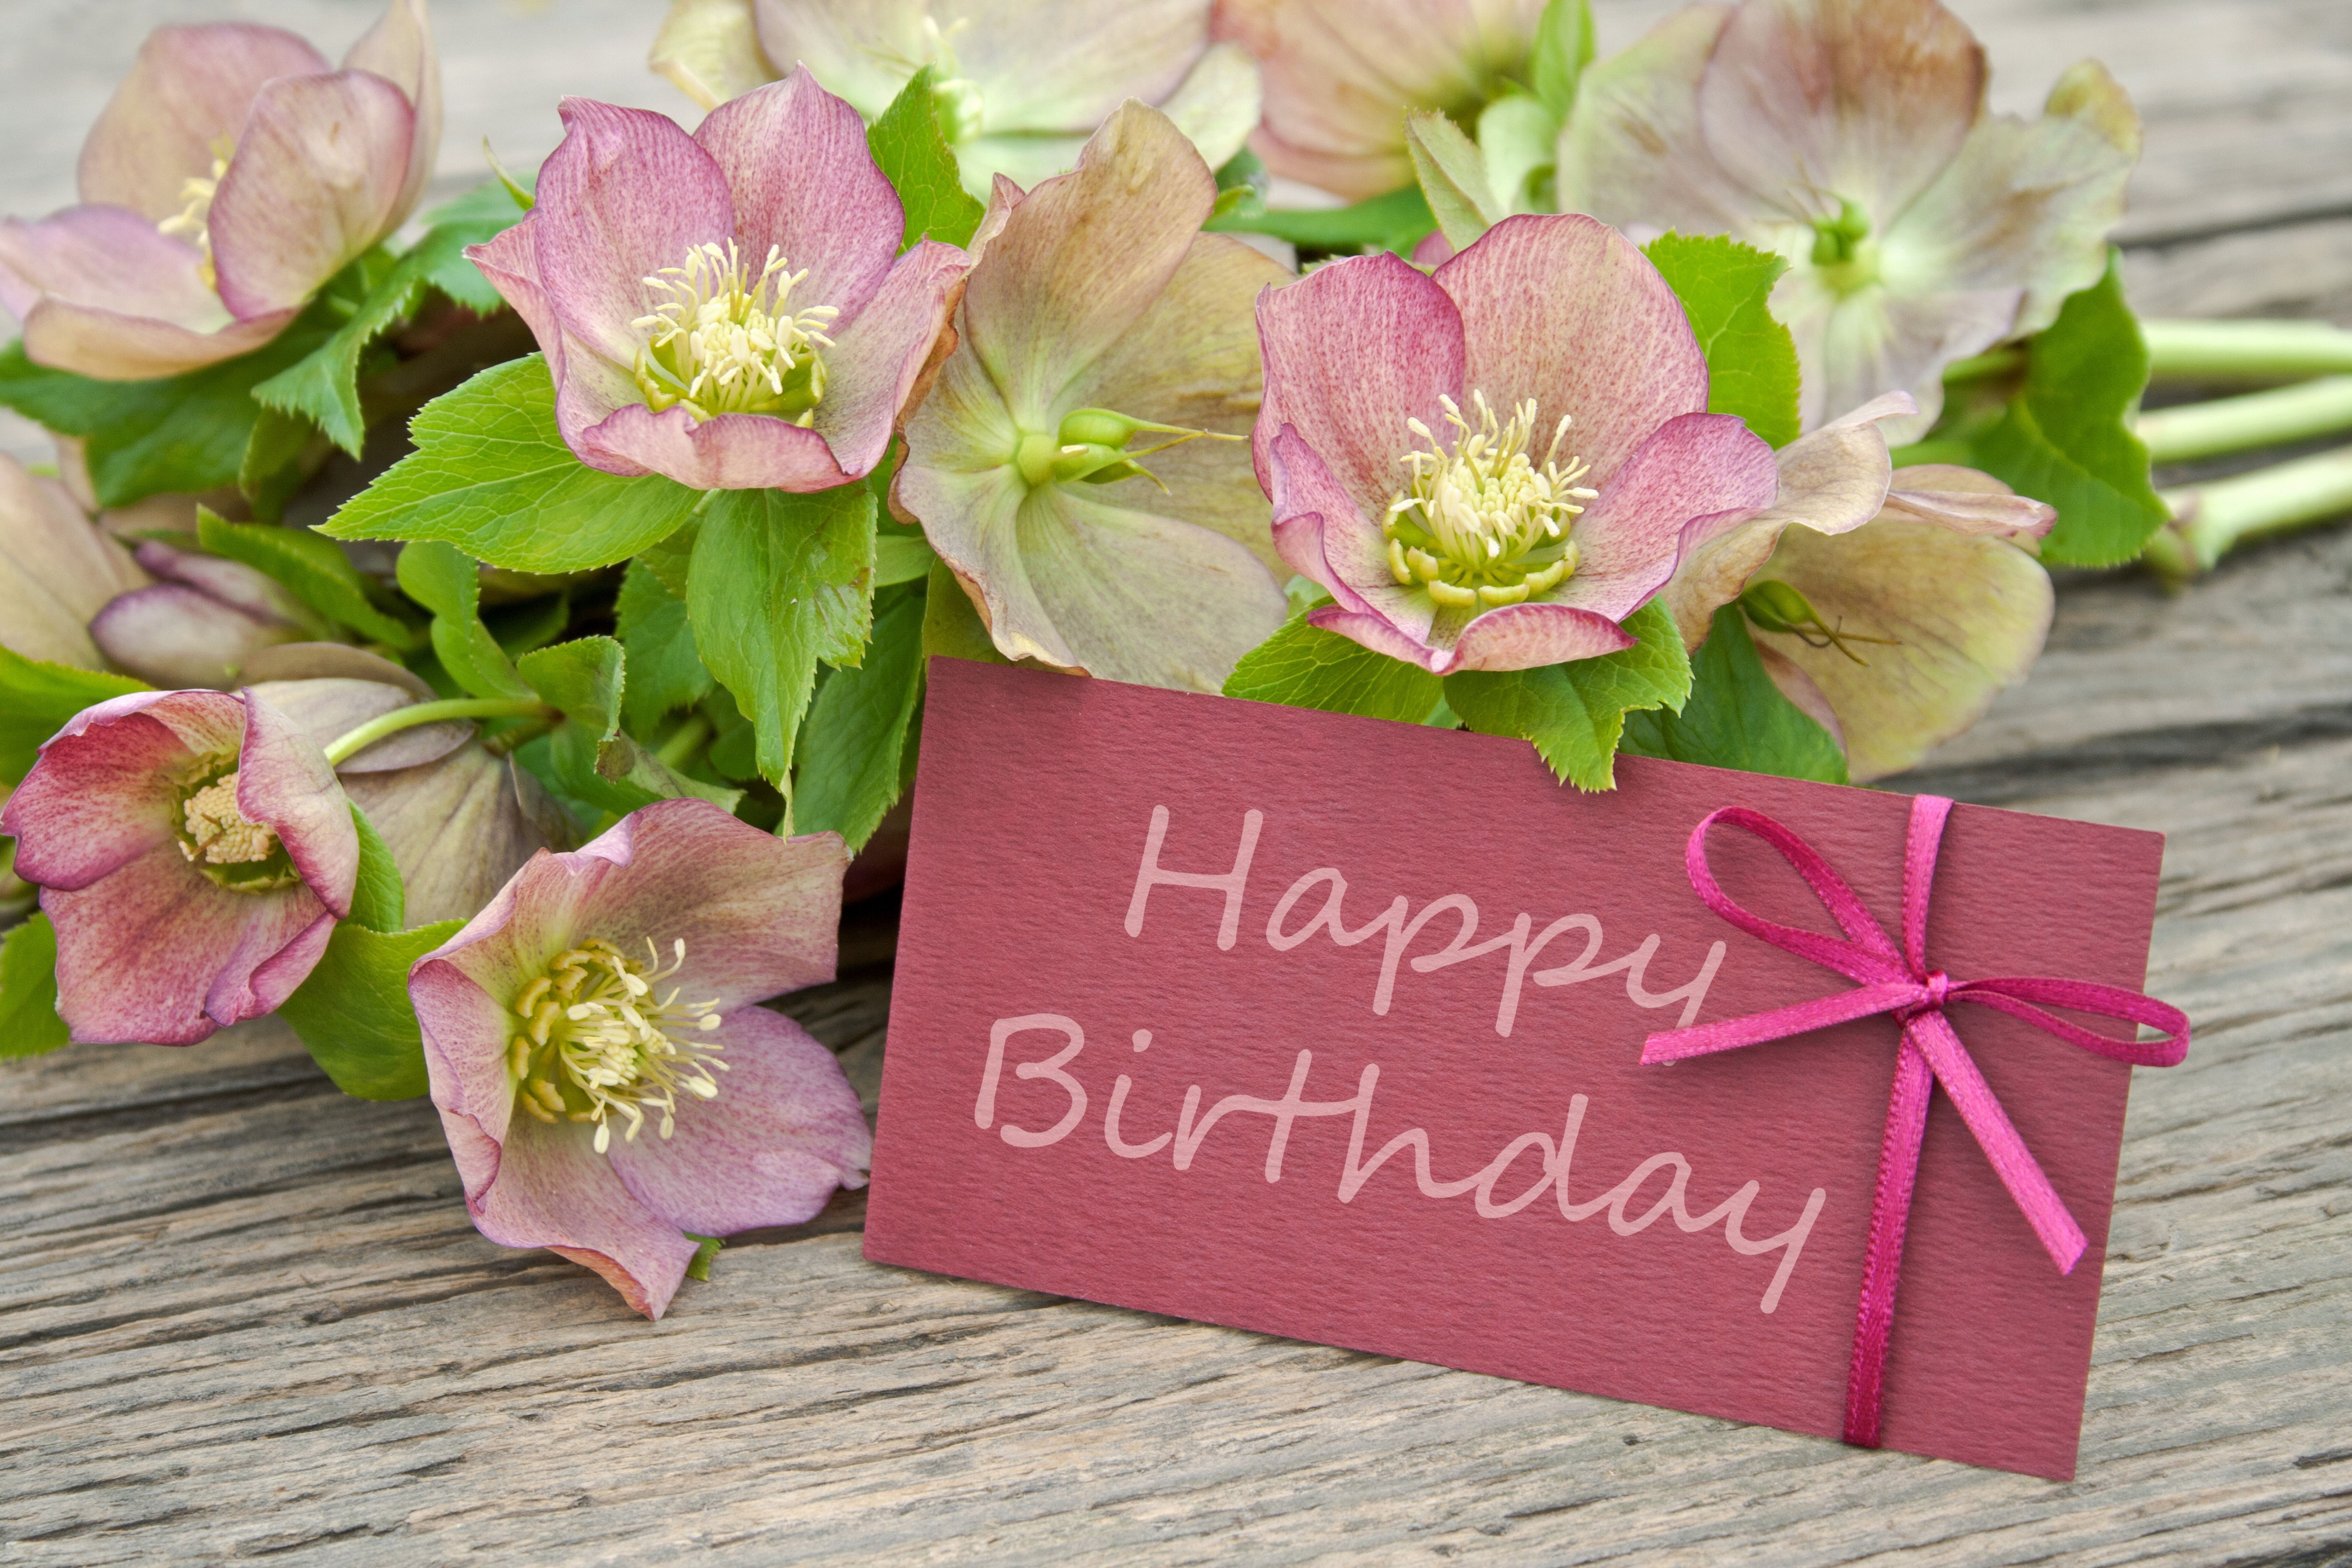 Happy Birthday Pics With Flowers Carte joyeux